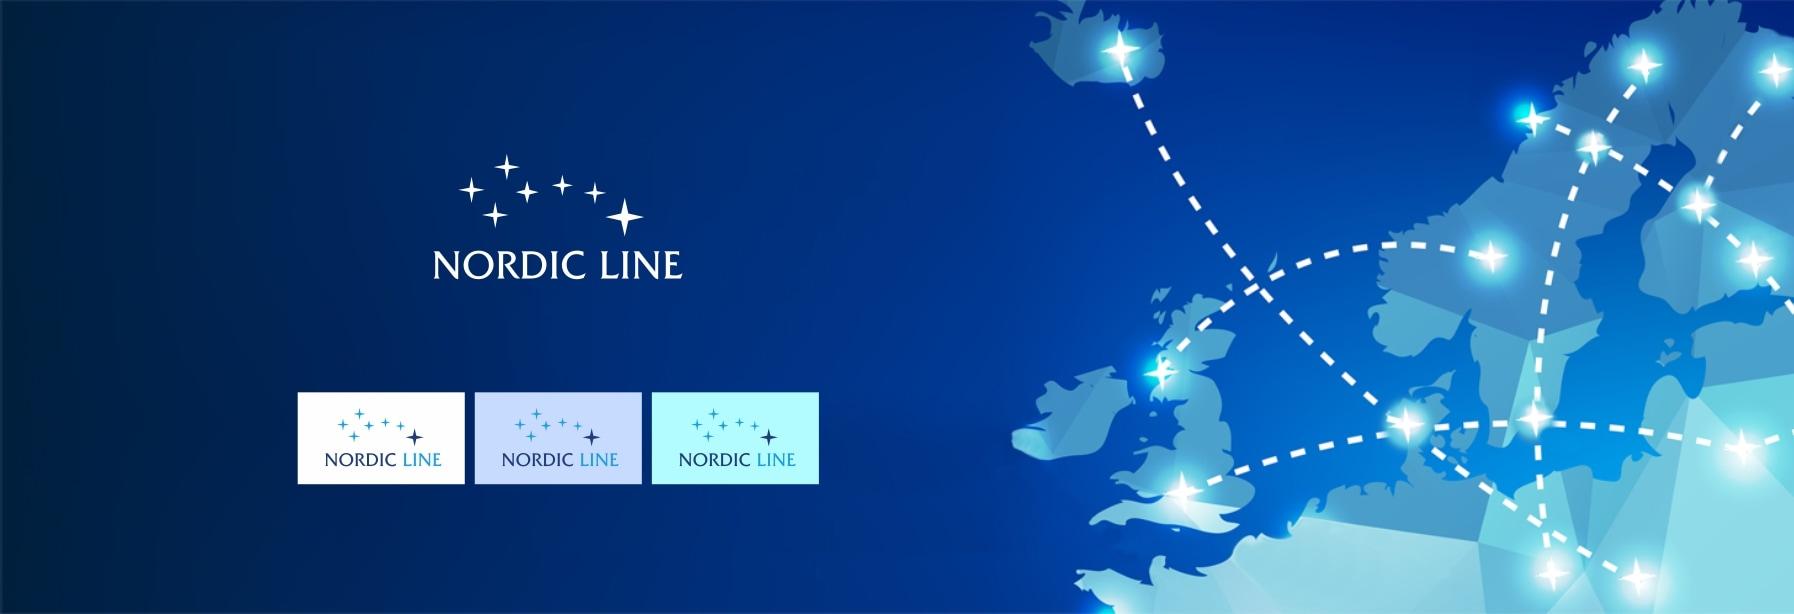 nordic line logotipas-min